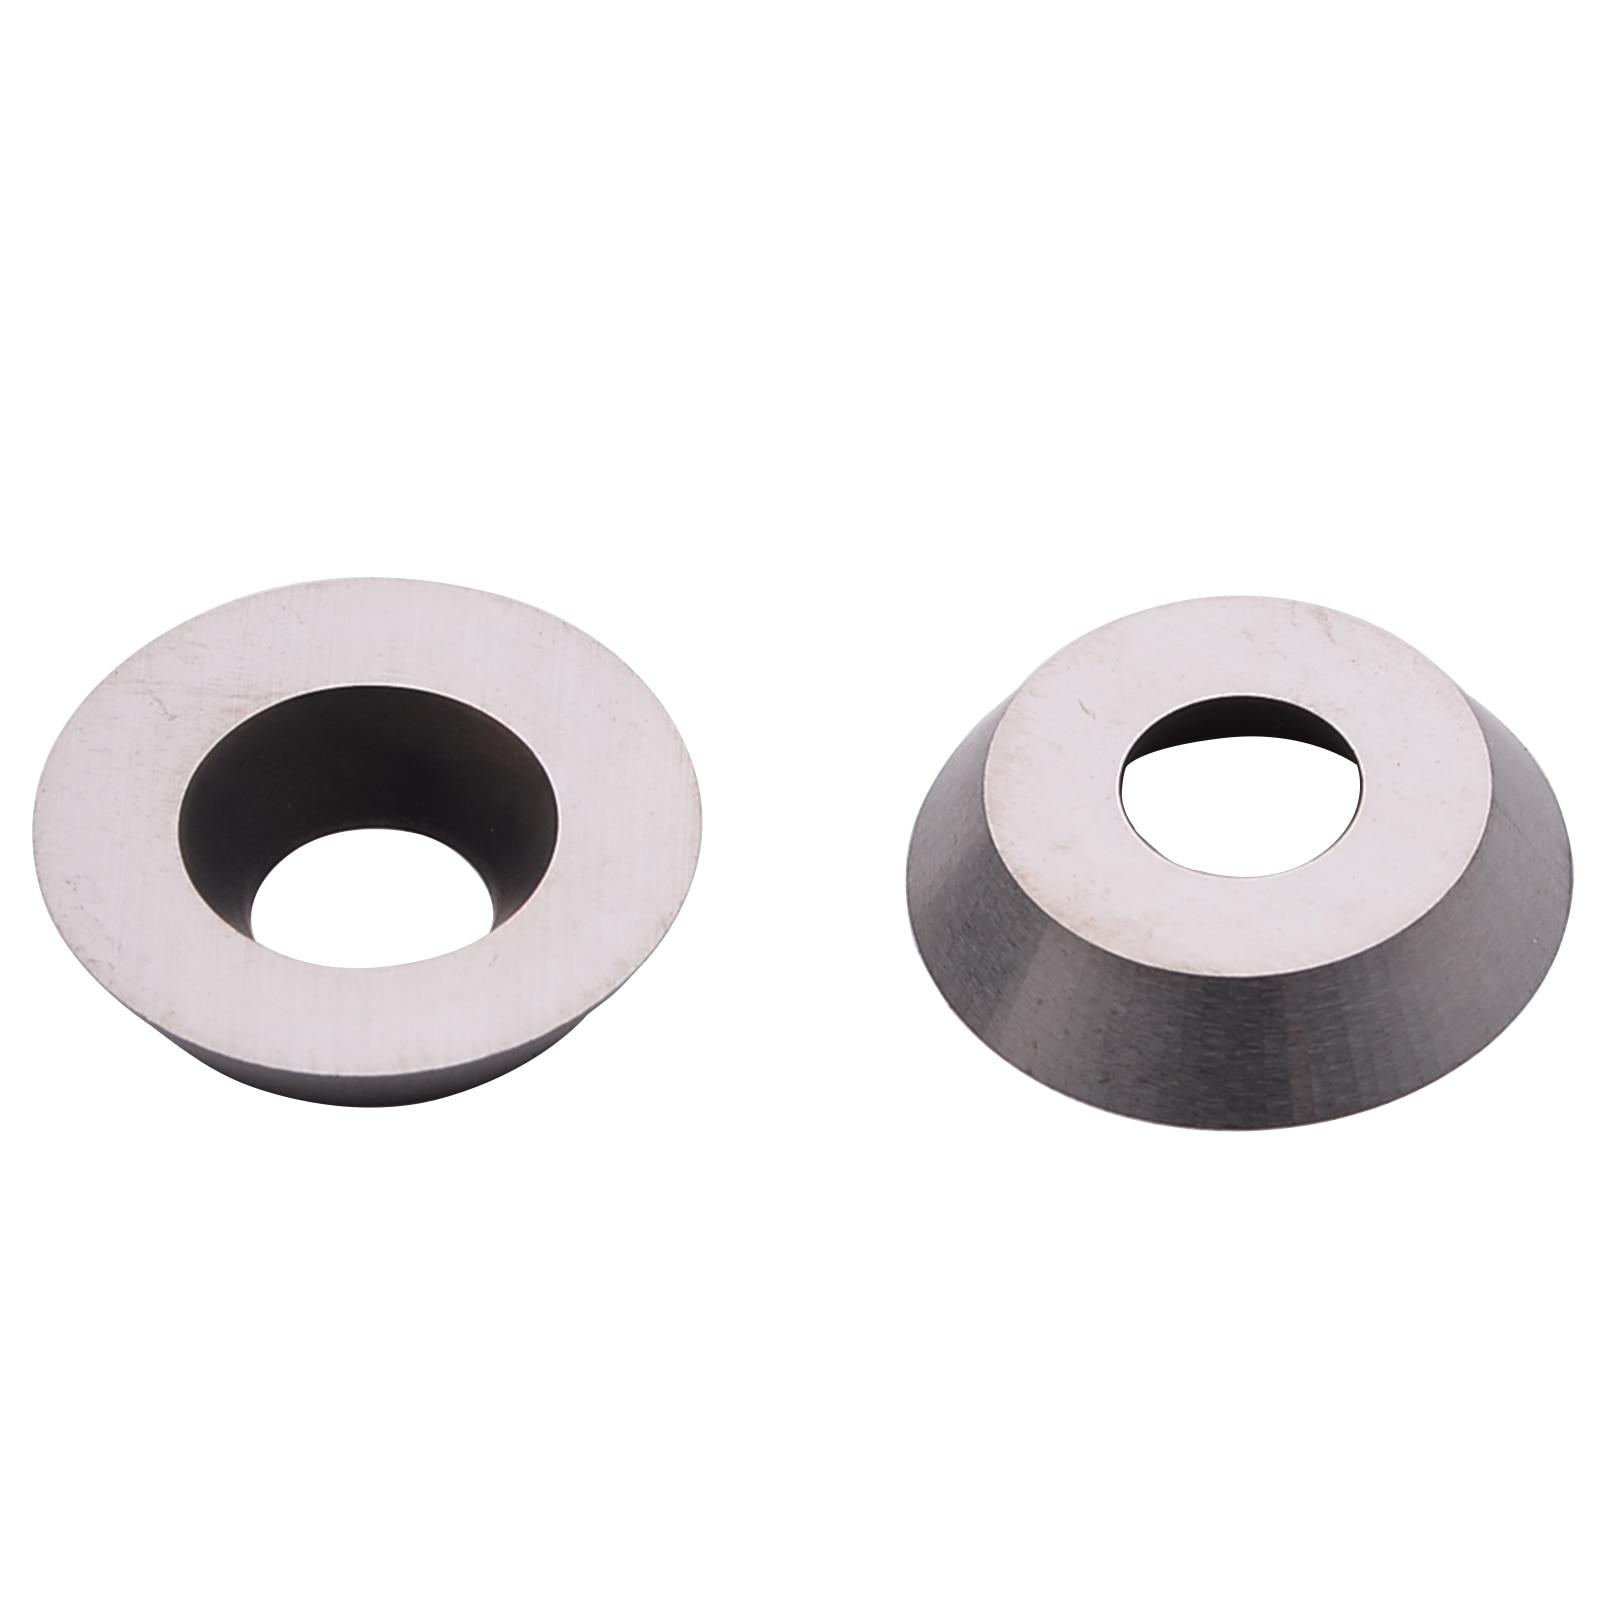 "Купить с кэшбэком 10pcs High Strength Round Carbide Cutter Insert 1/2"" 12x2.5mm Fits For Ci3 Wood Turning Tools"